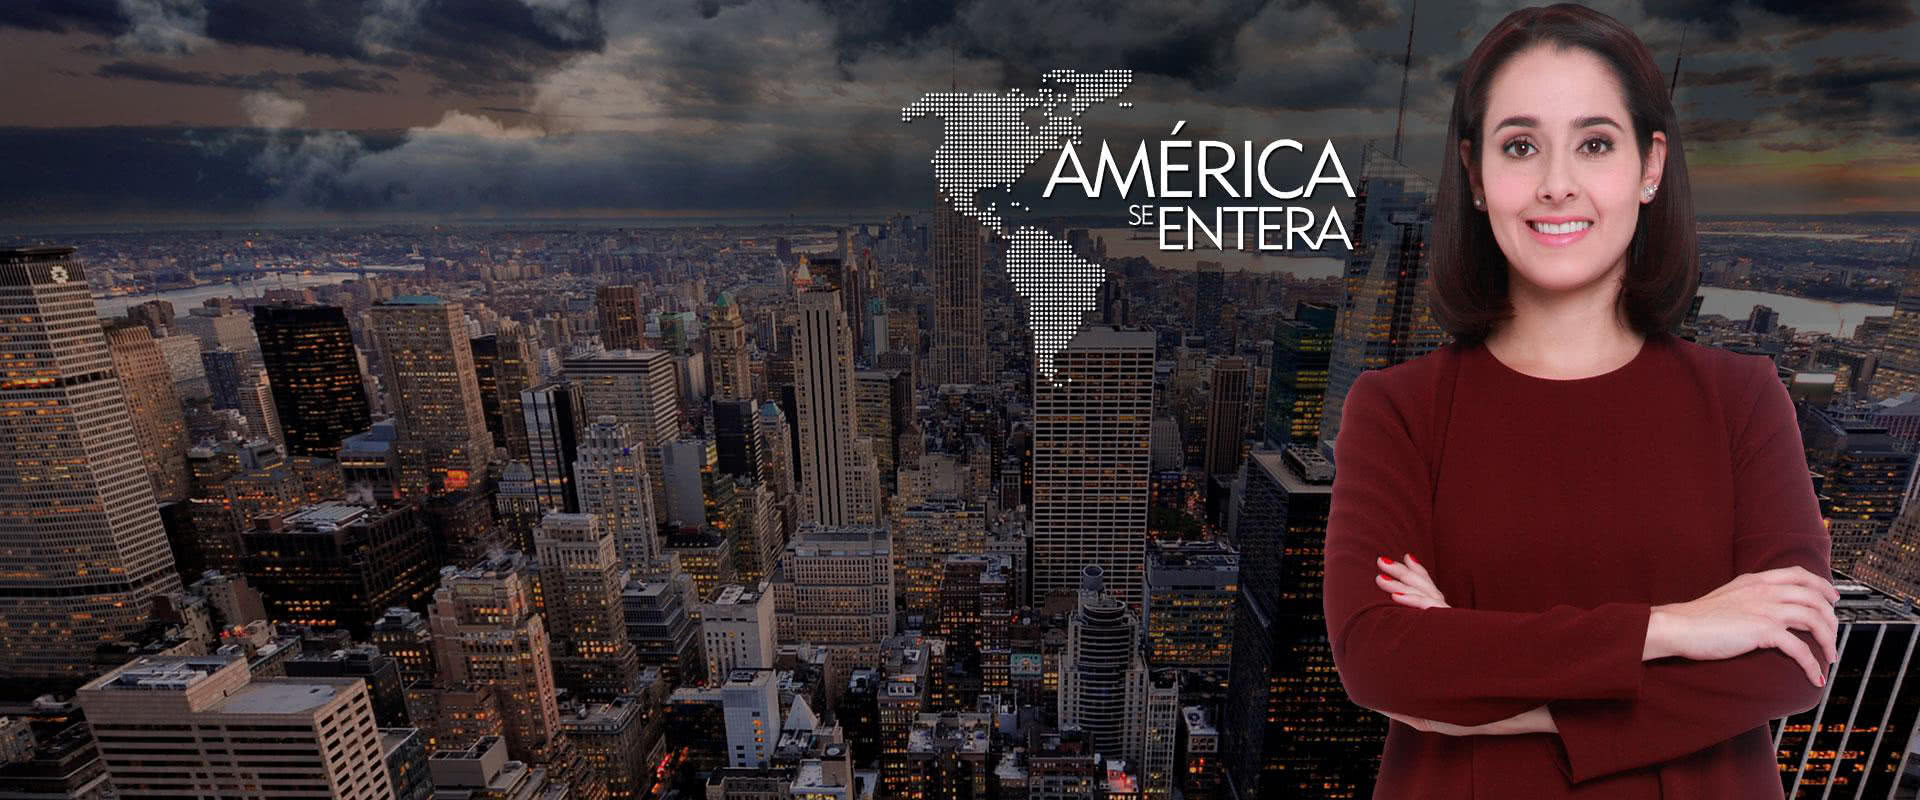 apertura-america1.jpg